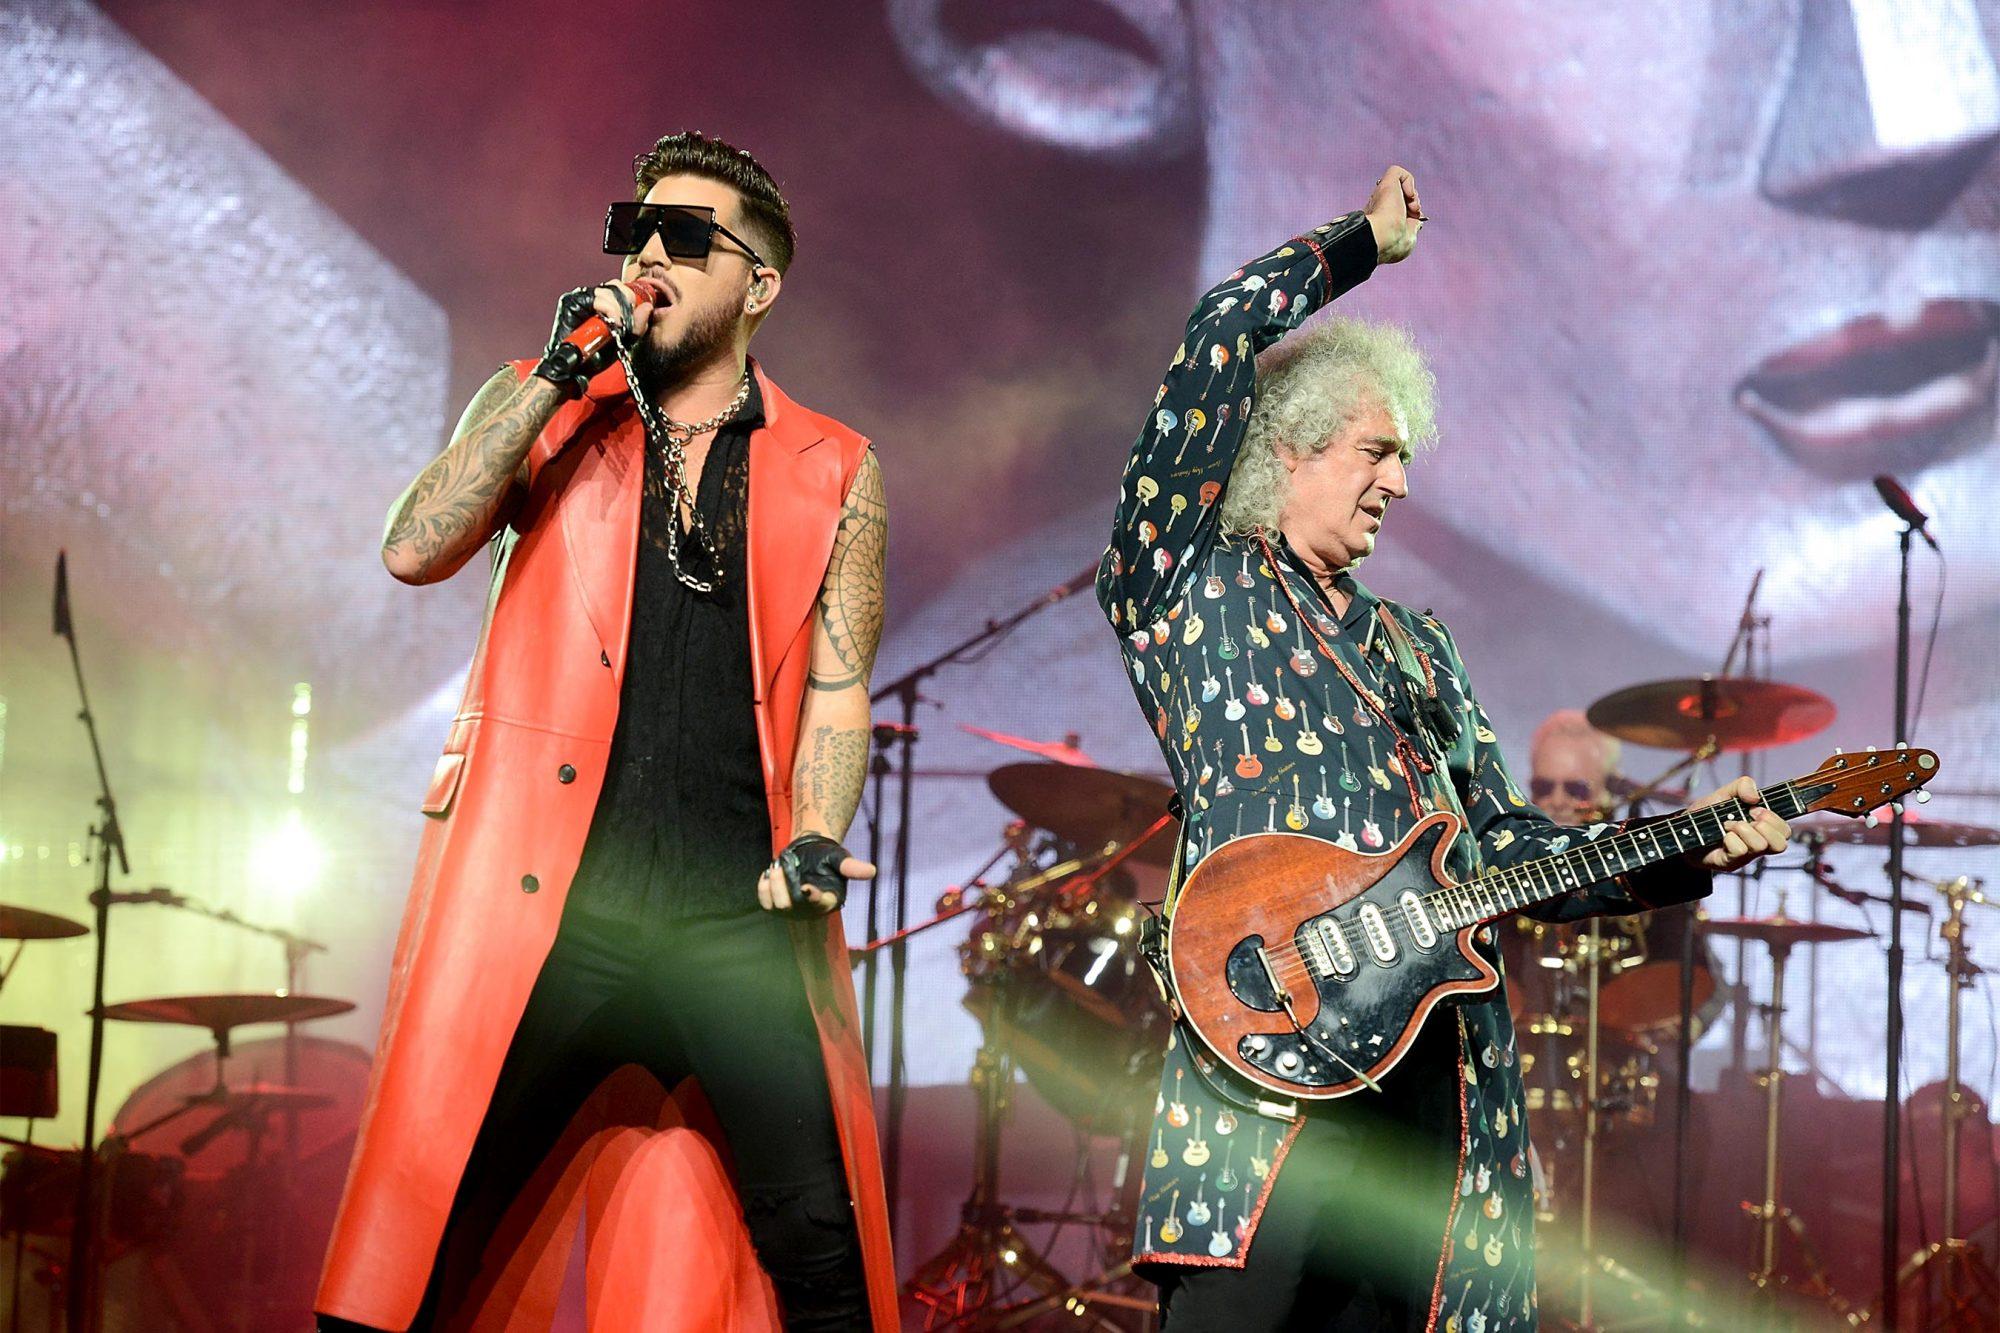 Queen And Adam Lambert Perform At Wembley Arena